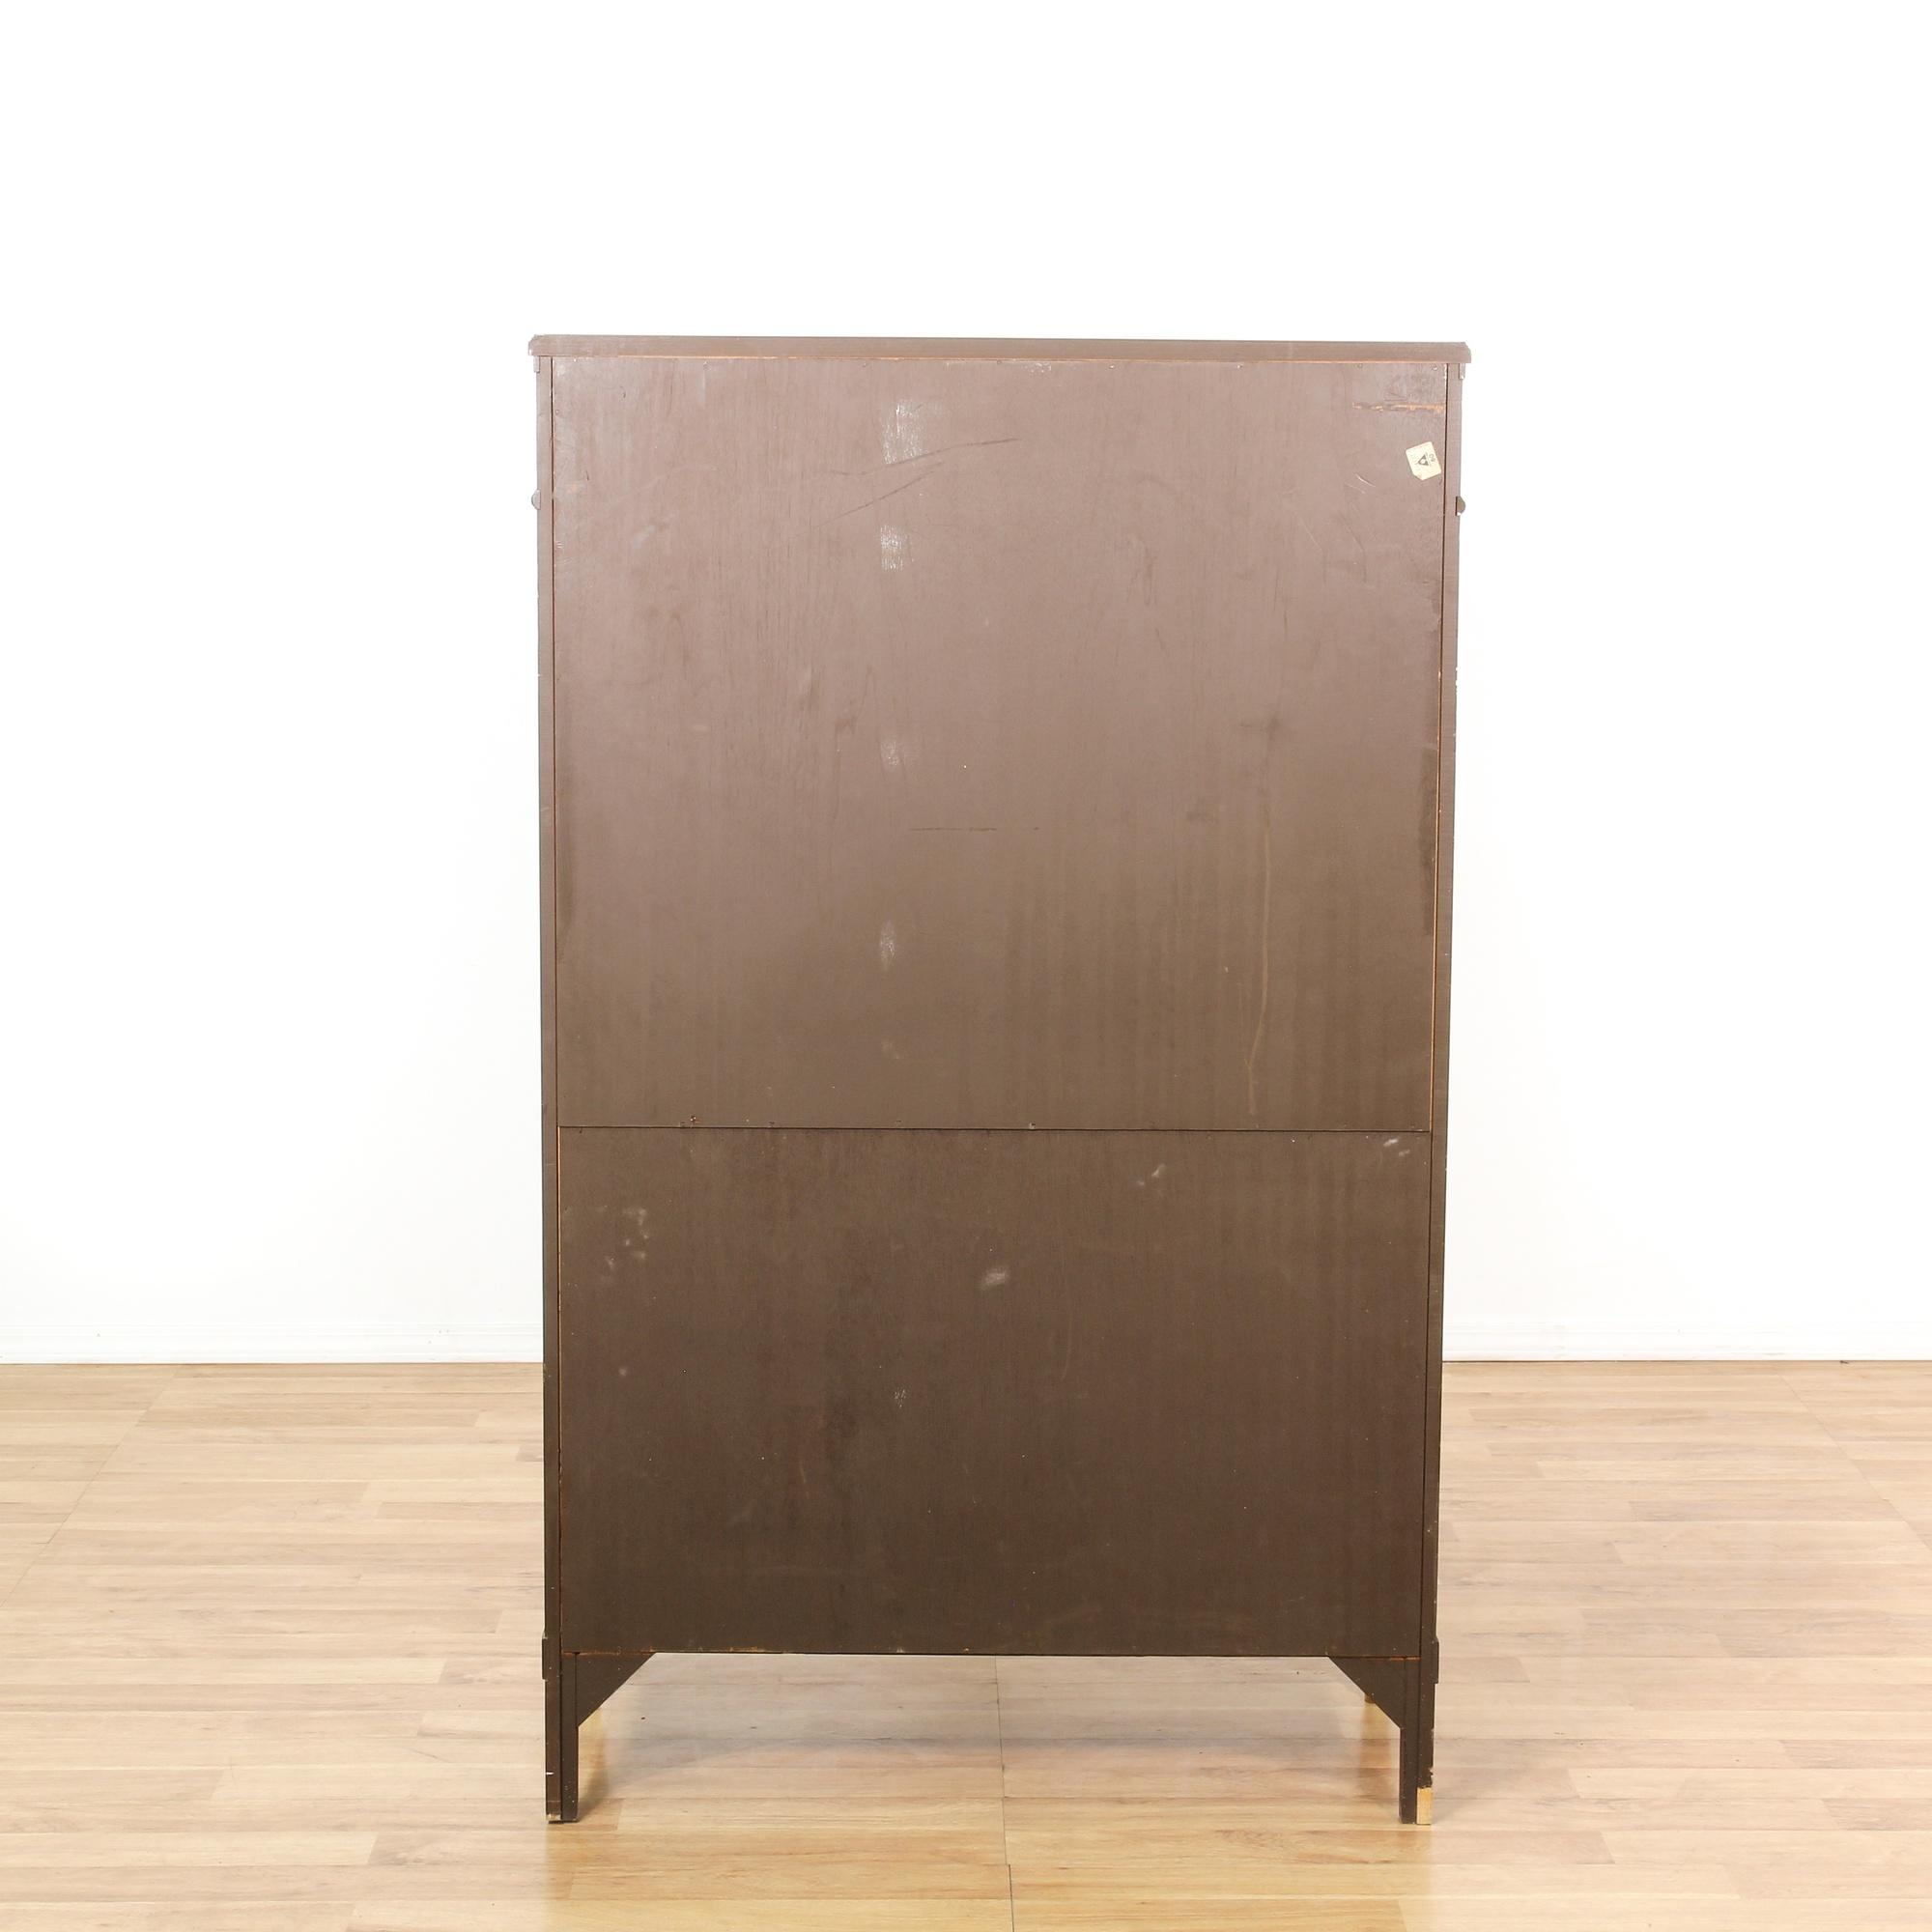 American Furniture Warehouse Desks ... Wardrobe Dresser | Loveseat Vintage Furniture San Diego & Los Angeles